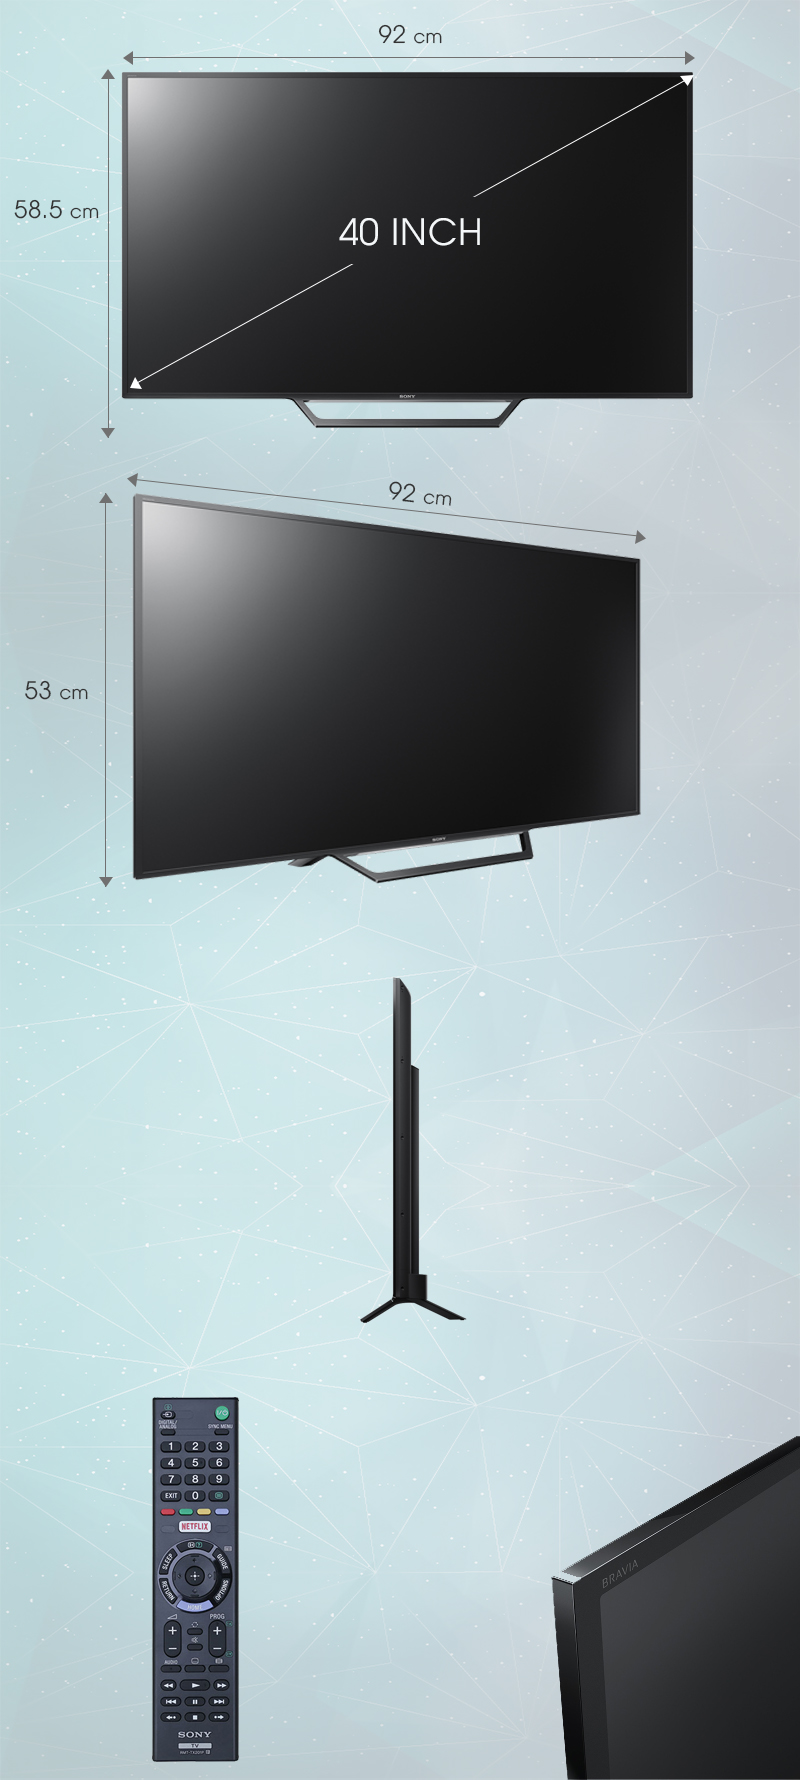 Smart Tivi Sony 40 inch KDL-40W650D - Kích thước tivi